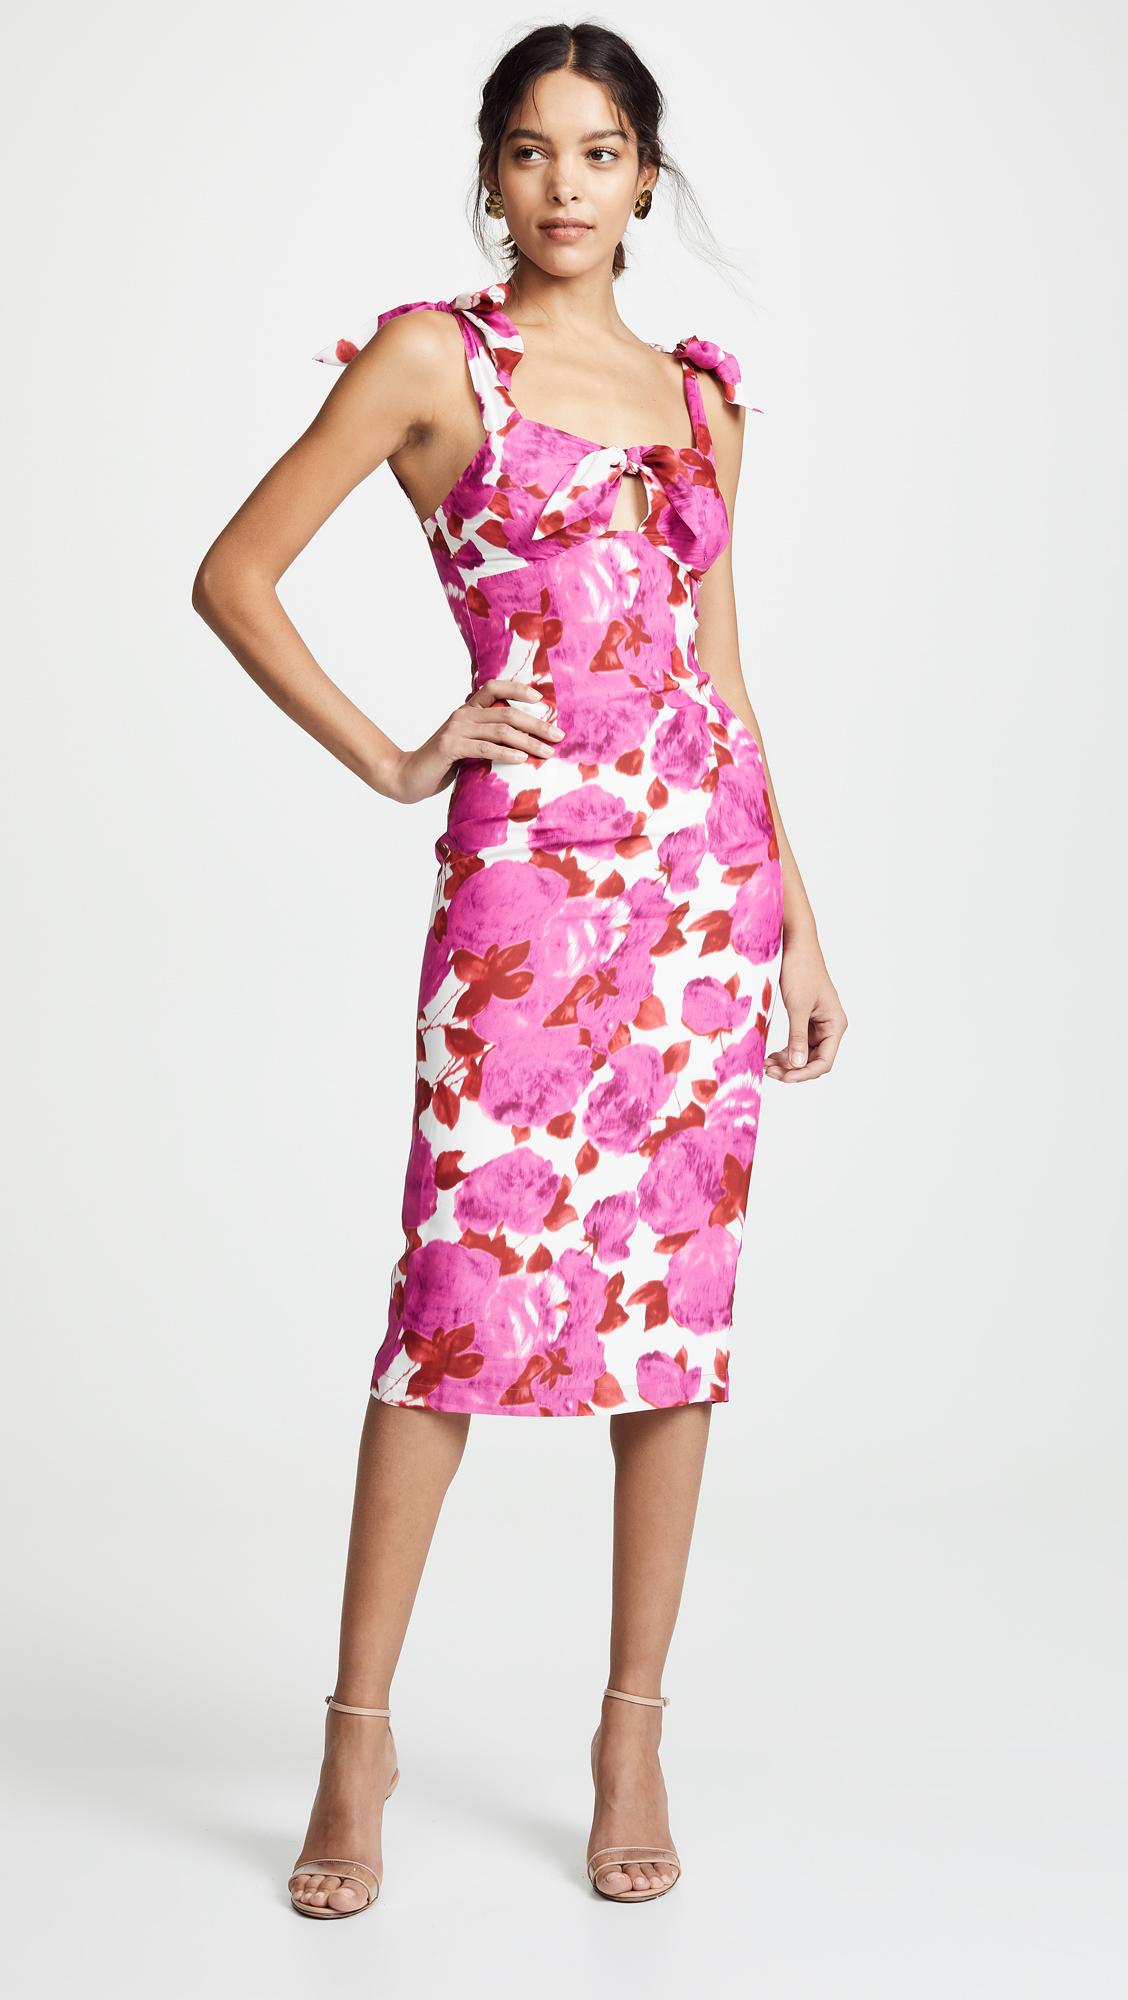 61c5e222a0b Alice McCall Fuchsia Bloom Dress